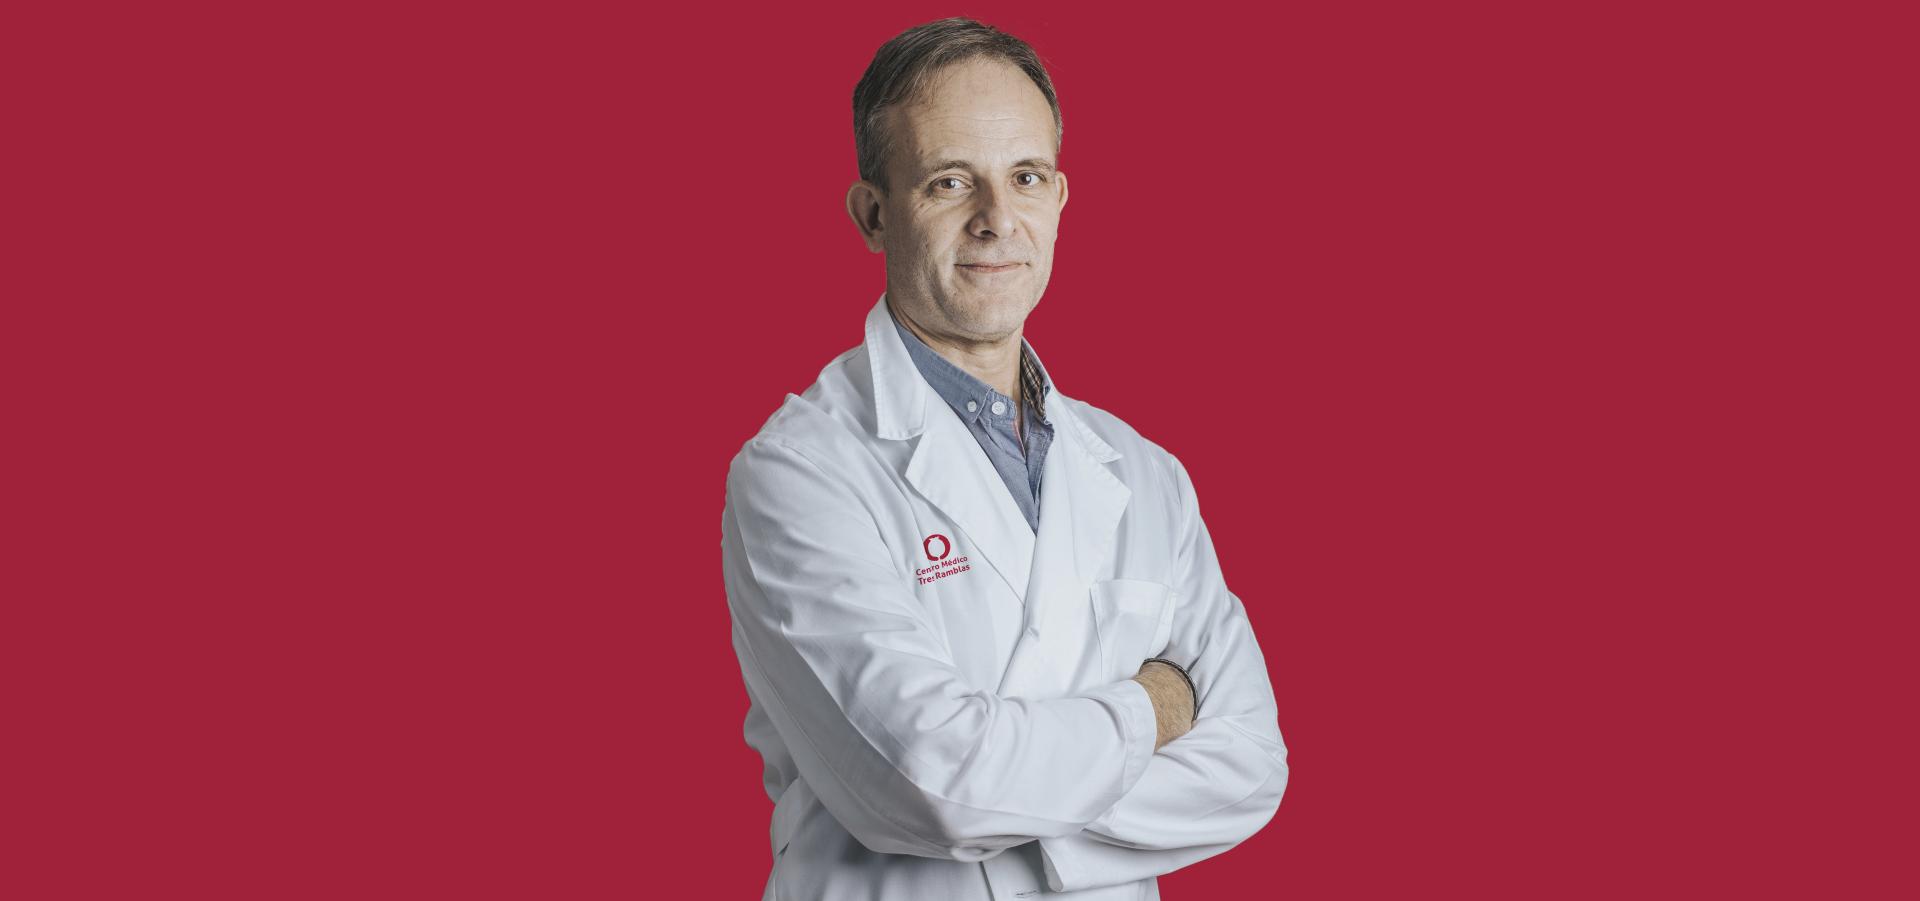 Dr. Sergio Pérez Ventura